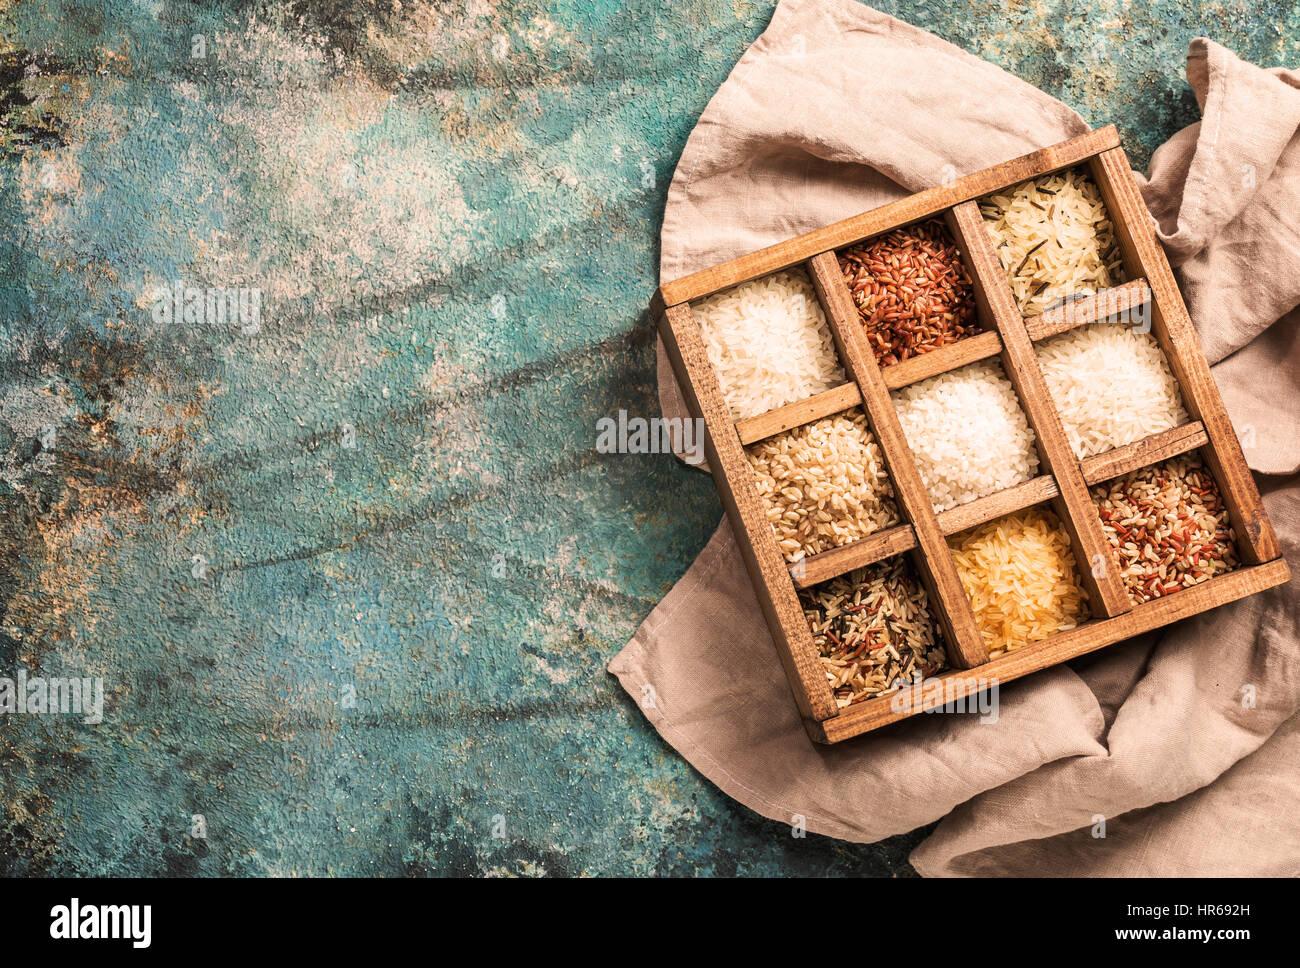 Varieties of rice in printers box, jasmine, wild, white, pearl, forbidden, jade, basmati and barley Top view - Stock Image